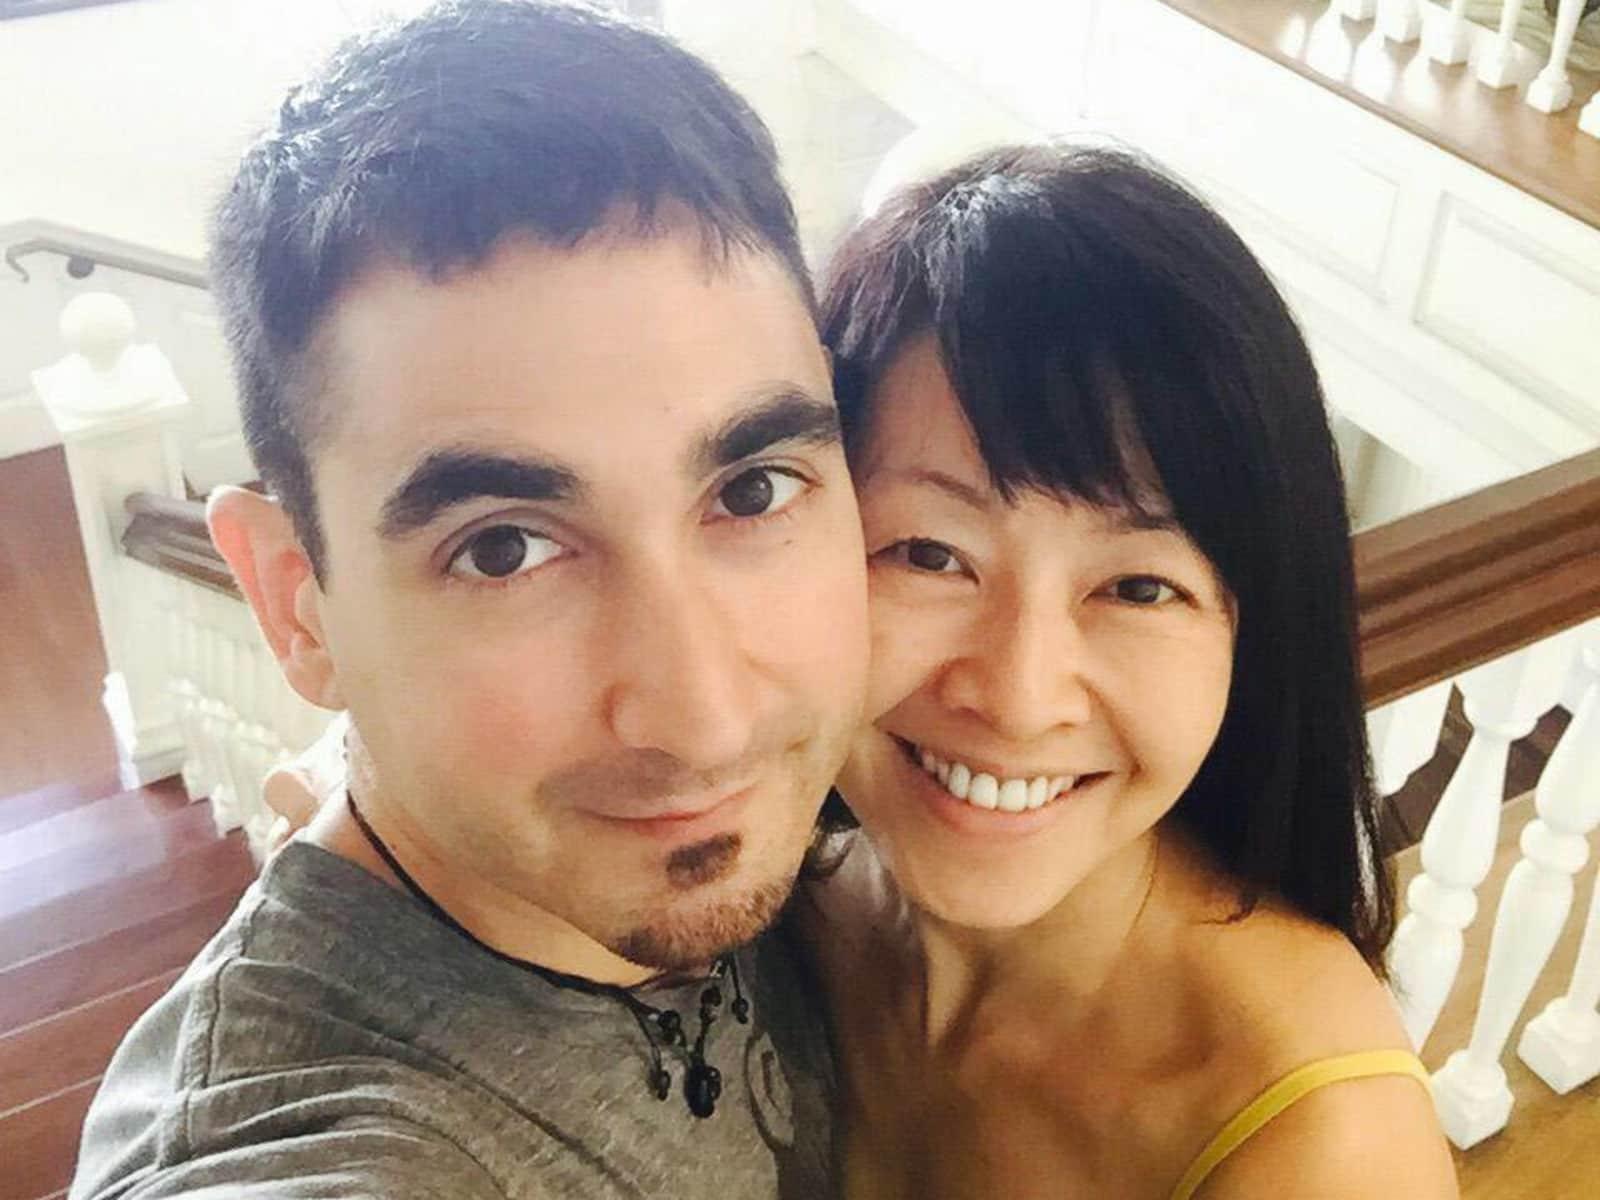 Arthur & Noriko from Los Angeles, California, United States